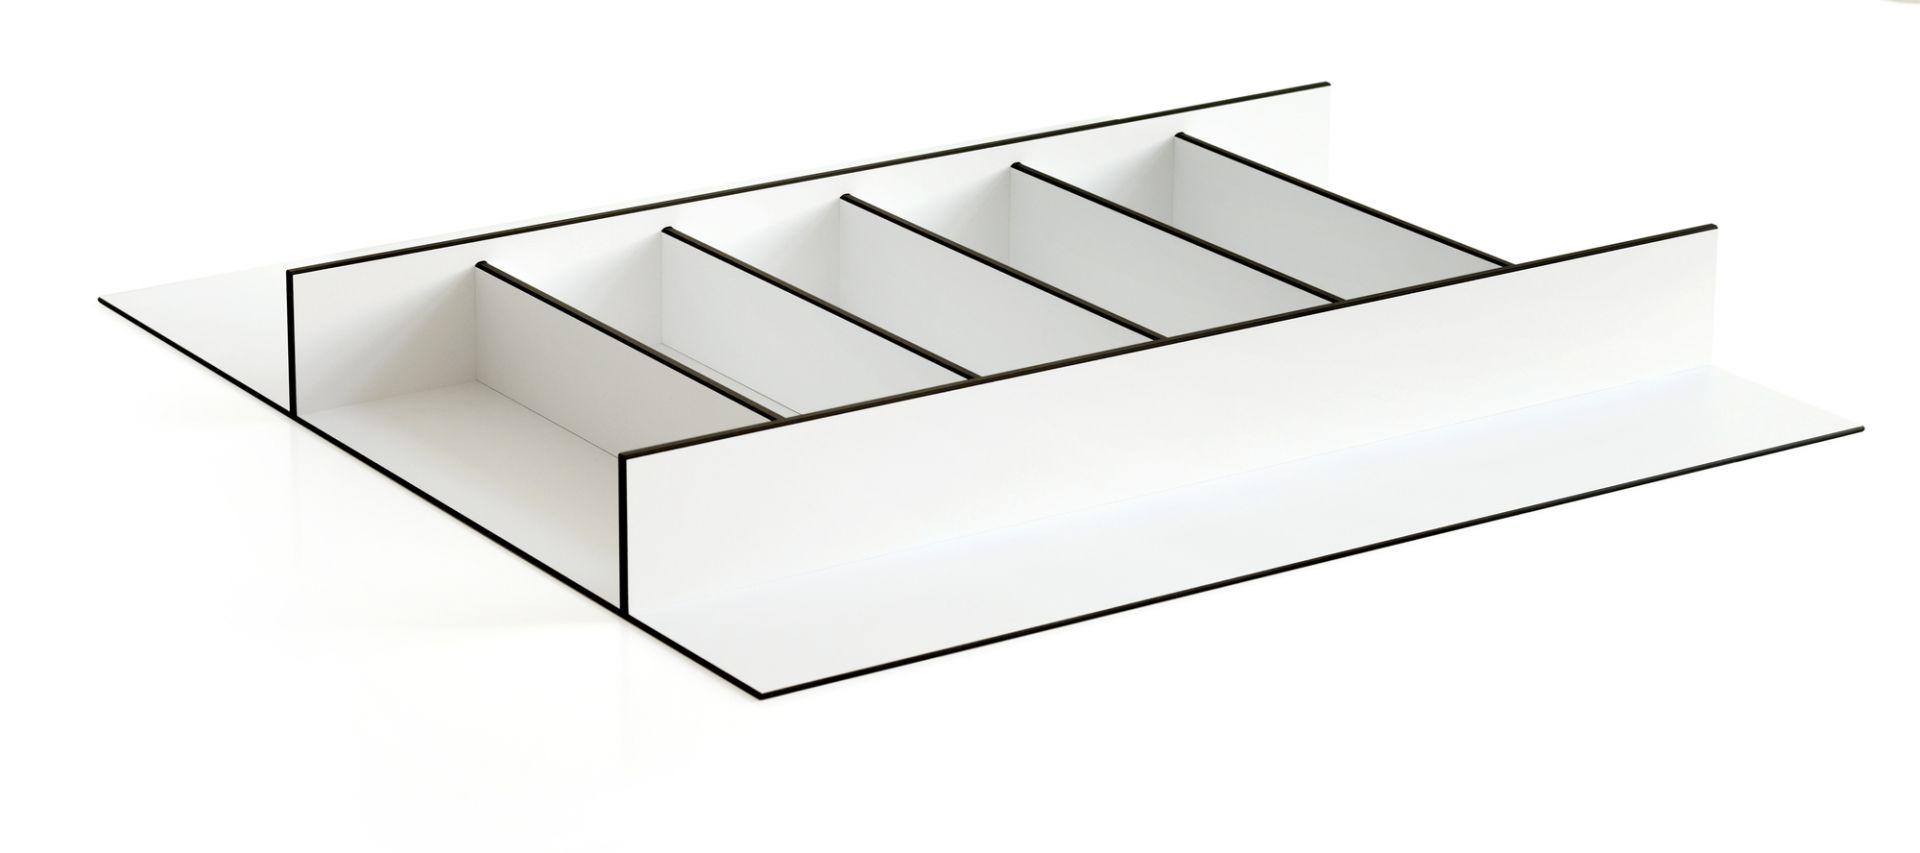 Cutlery for use Miniki White